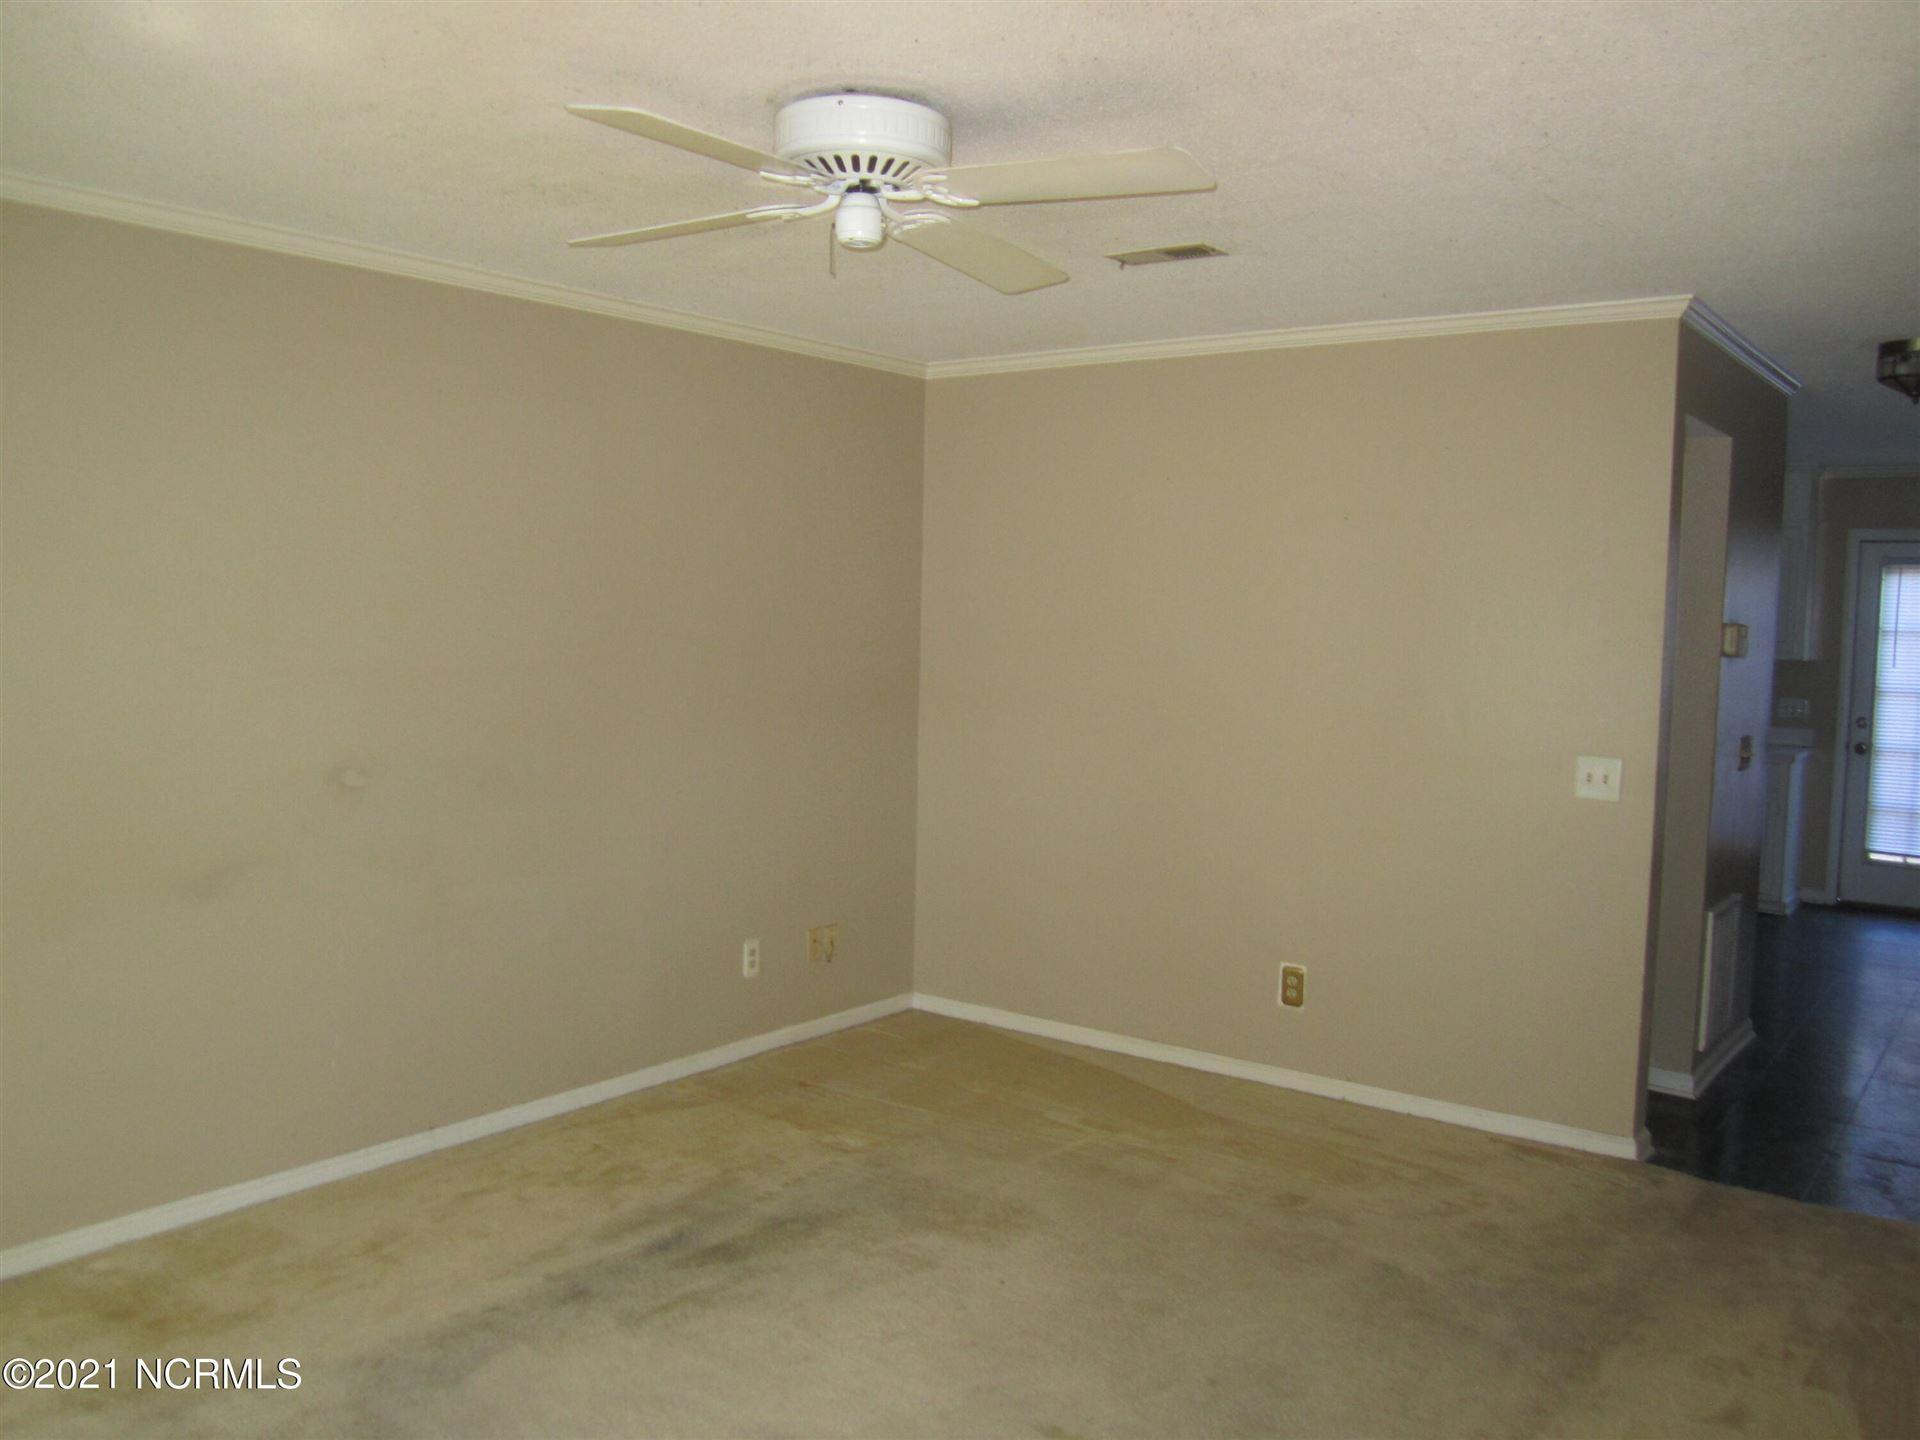 Photo of 24 Upton Drive, Greenville, NC 27858 (MLS # 100295518)